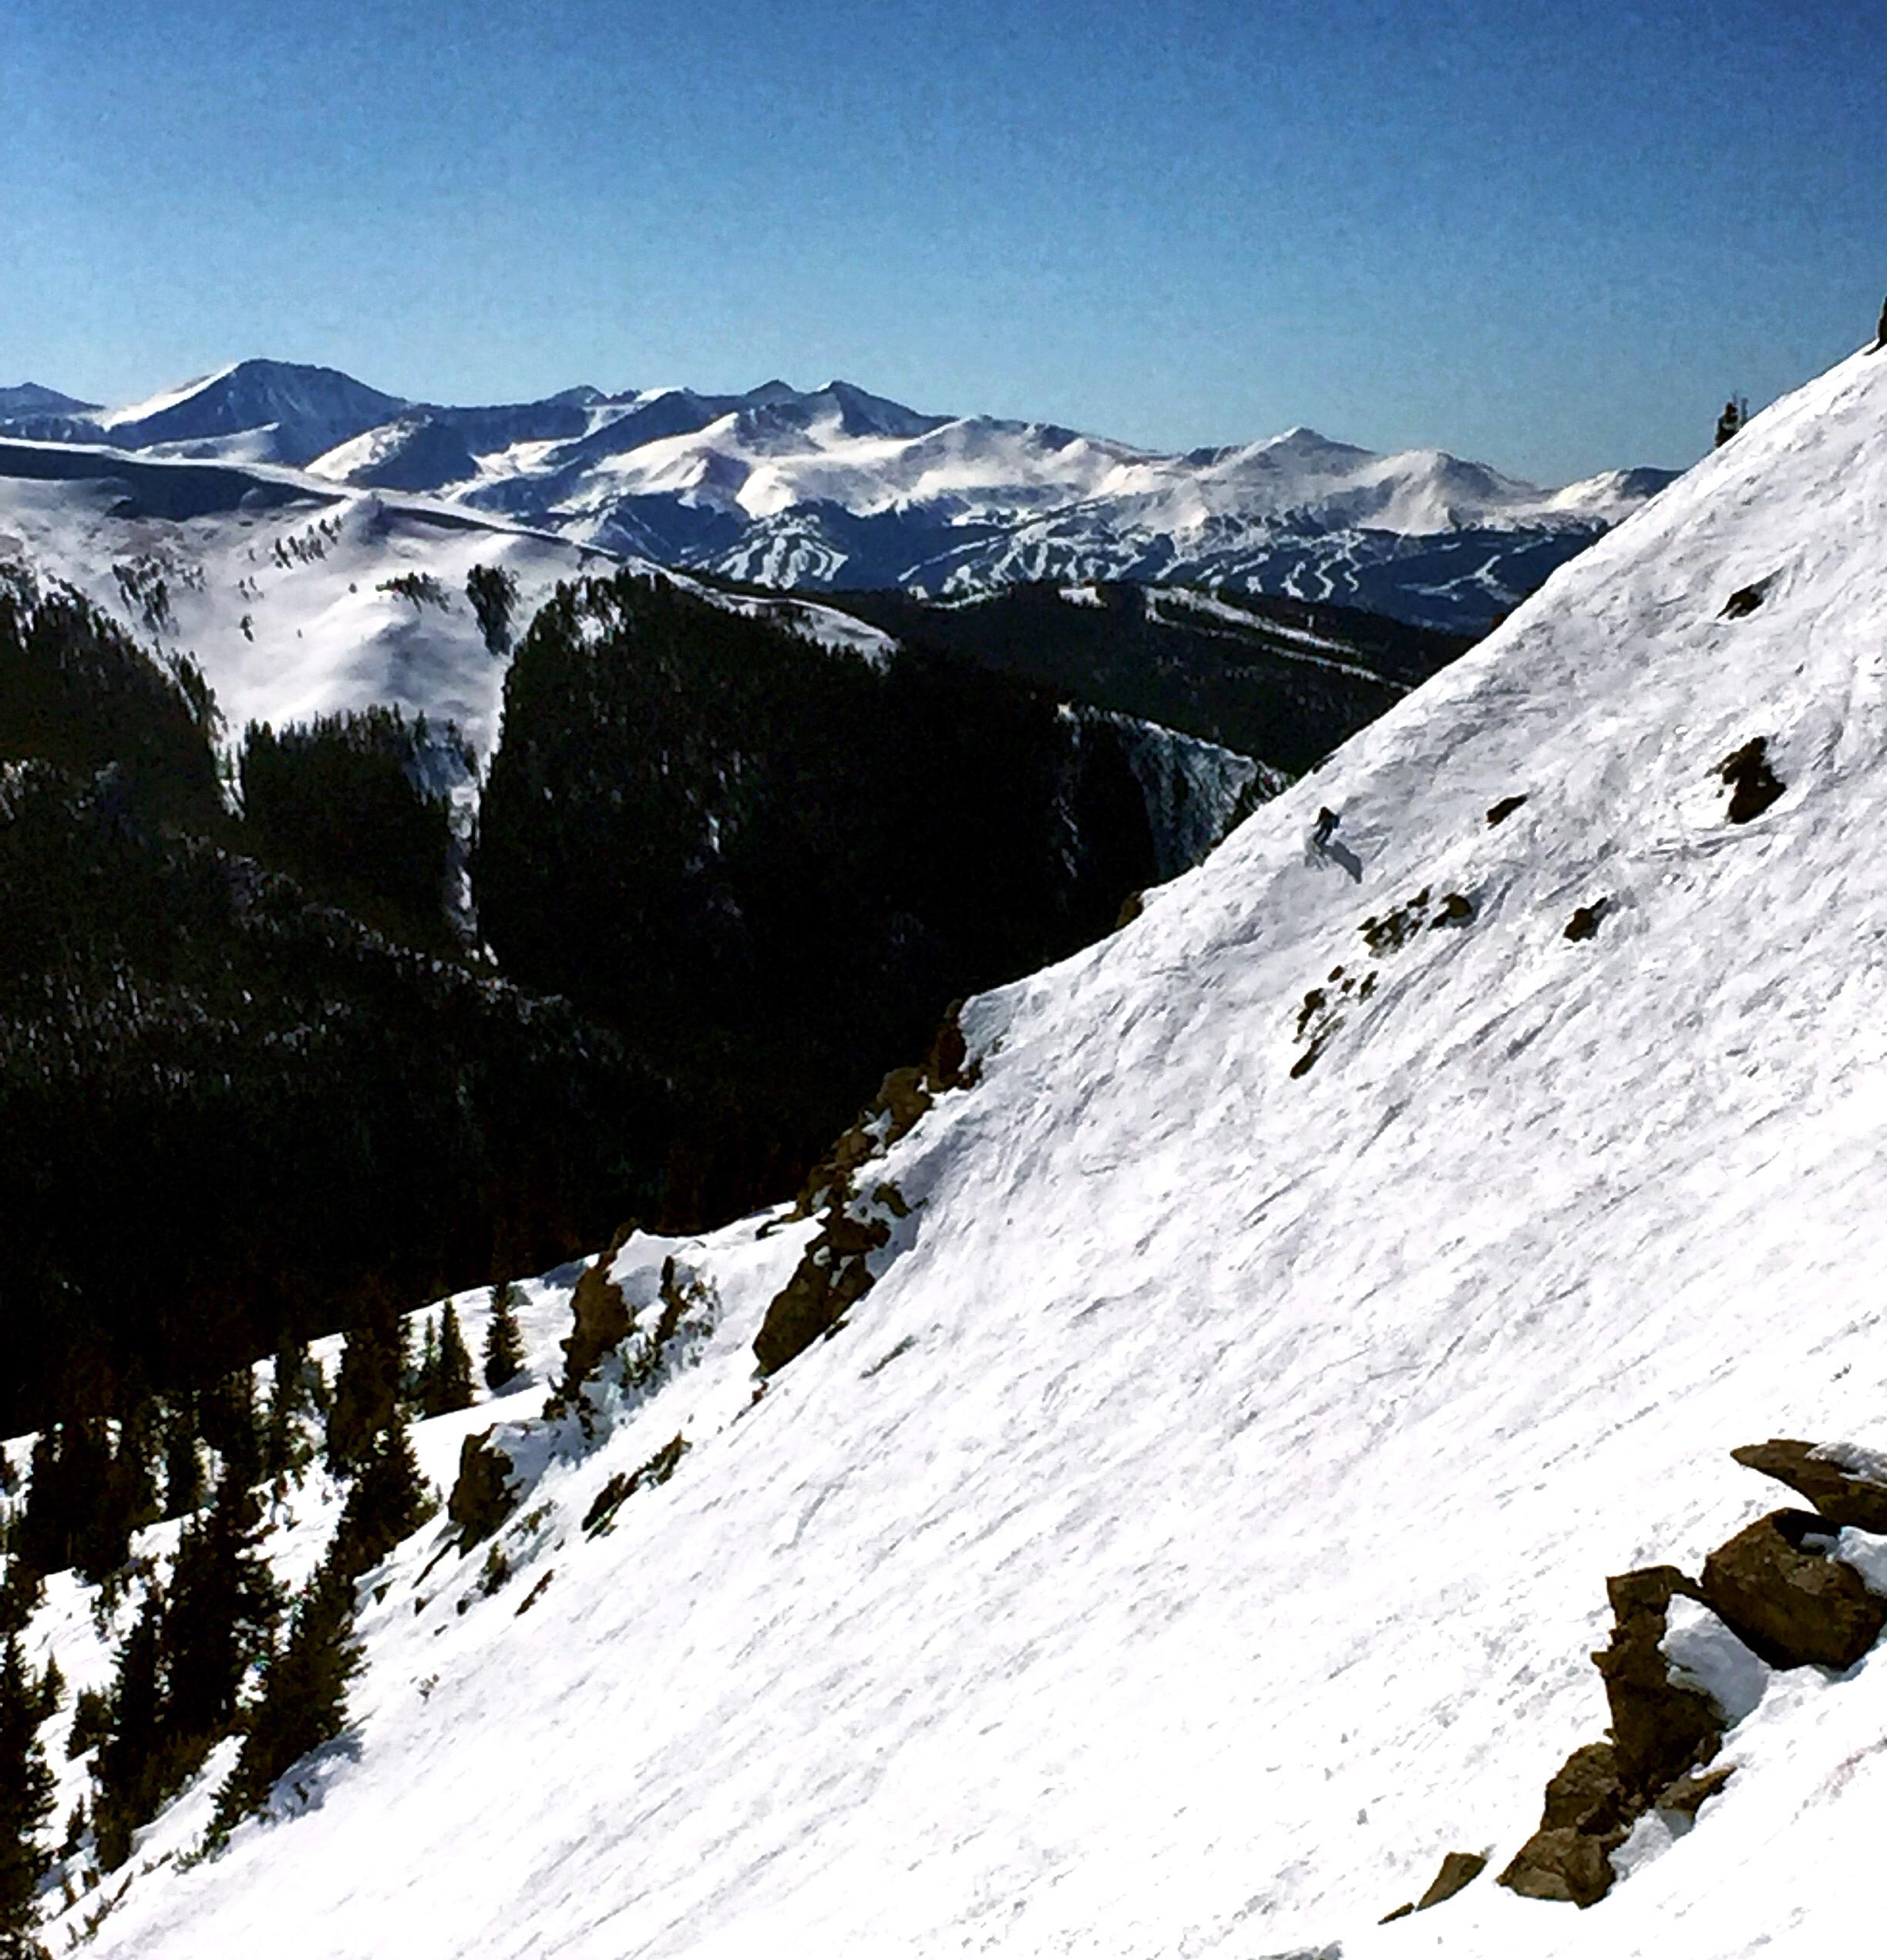 el squat on the End Zone ridge